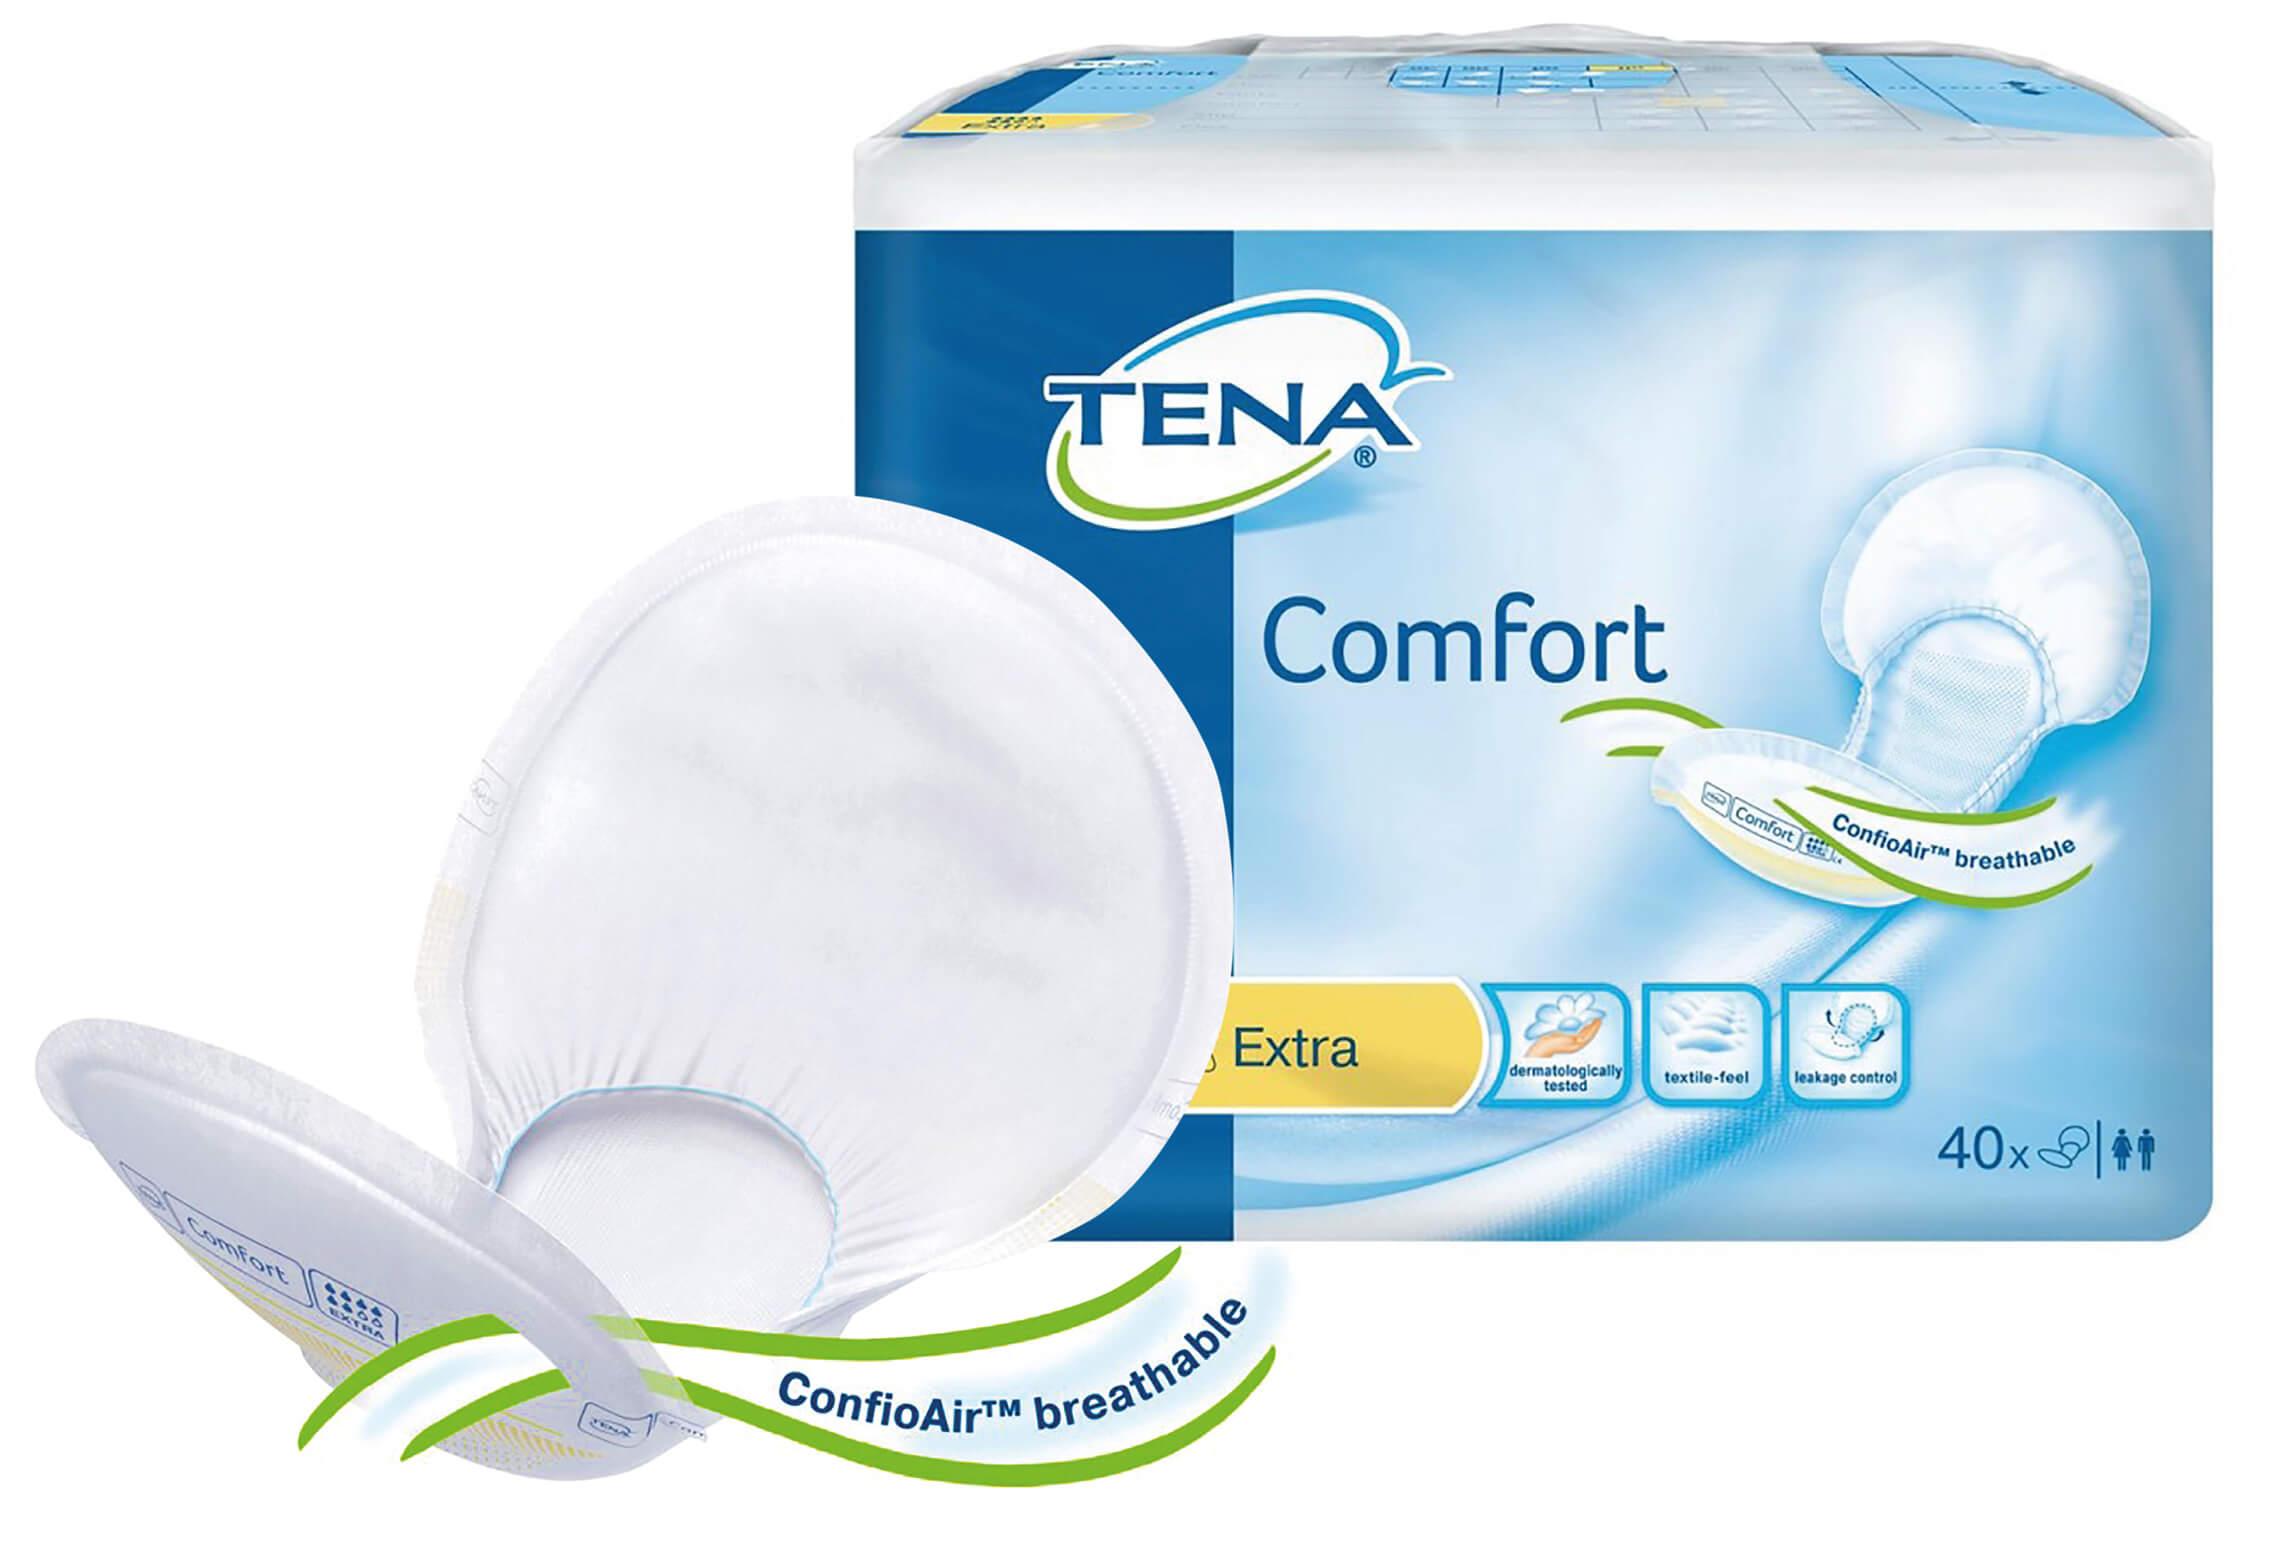 TENA Comfort Pads